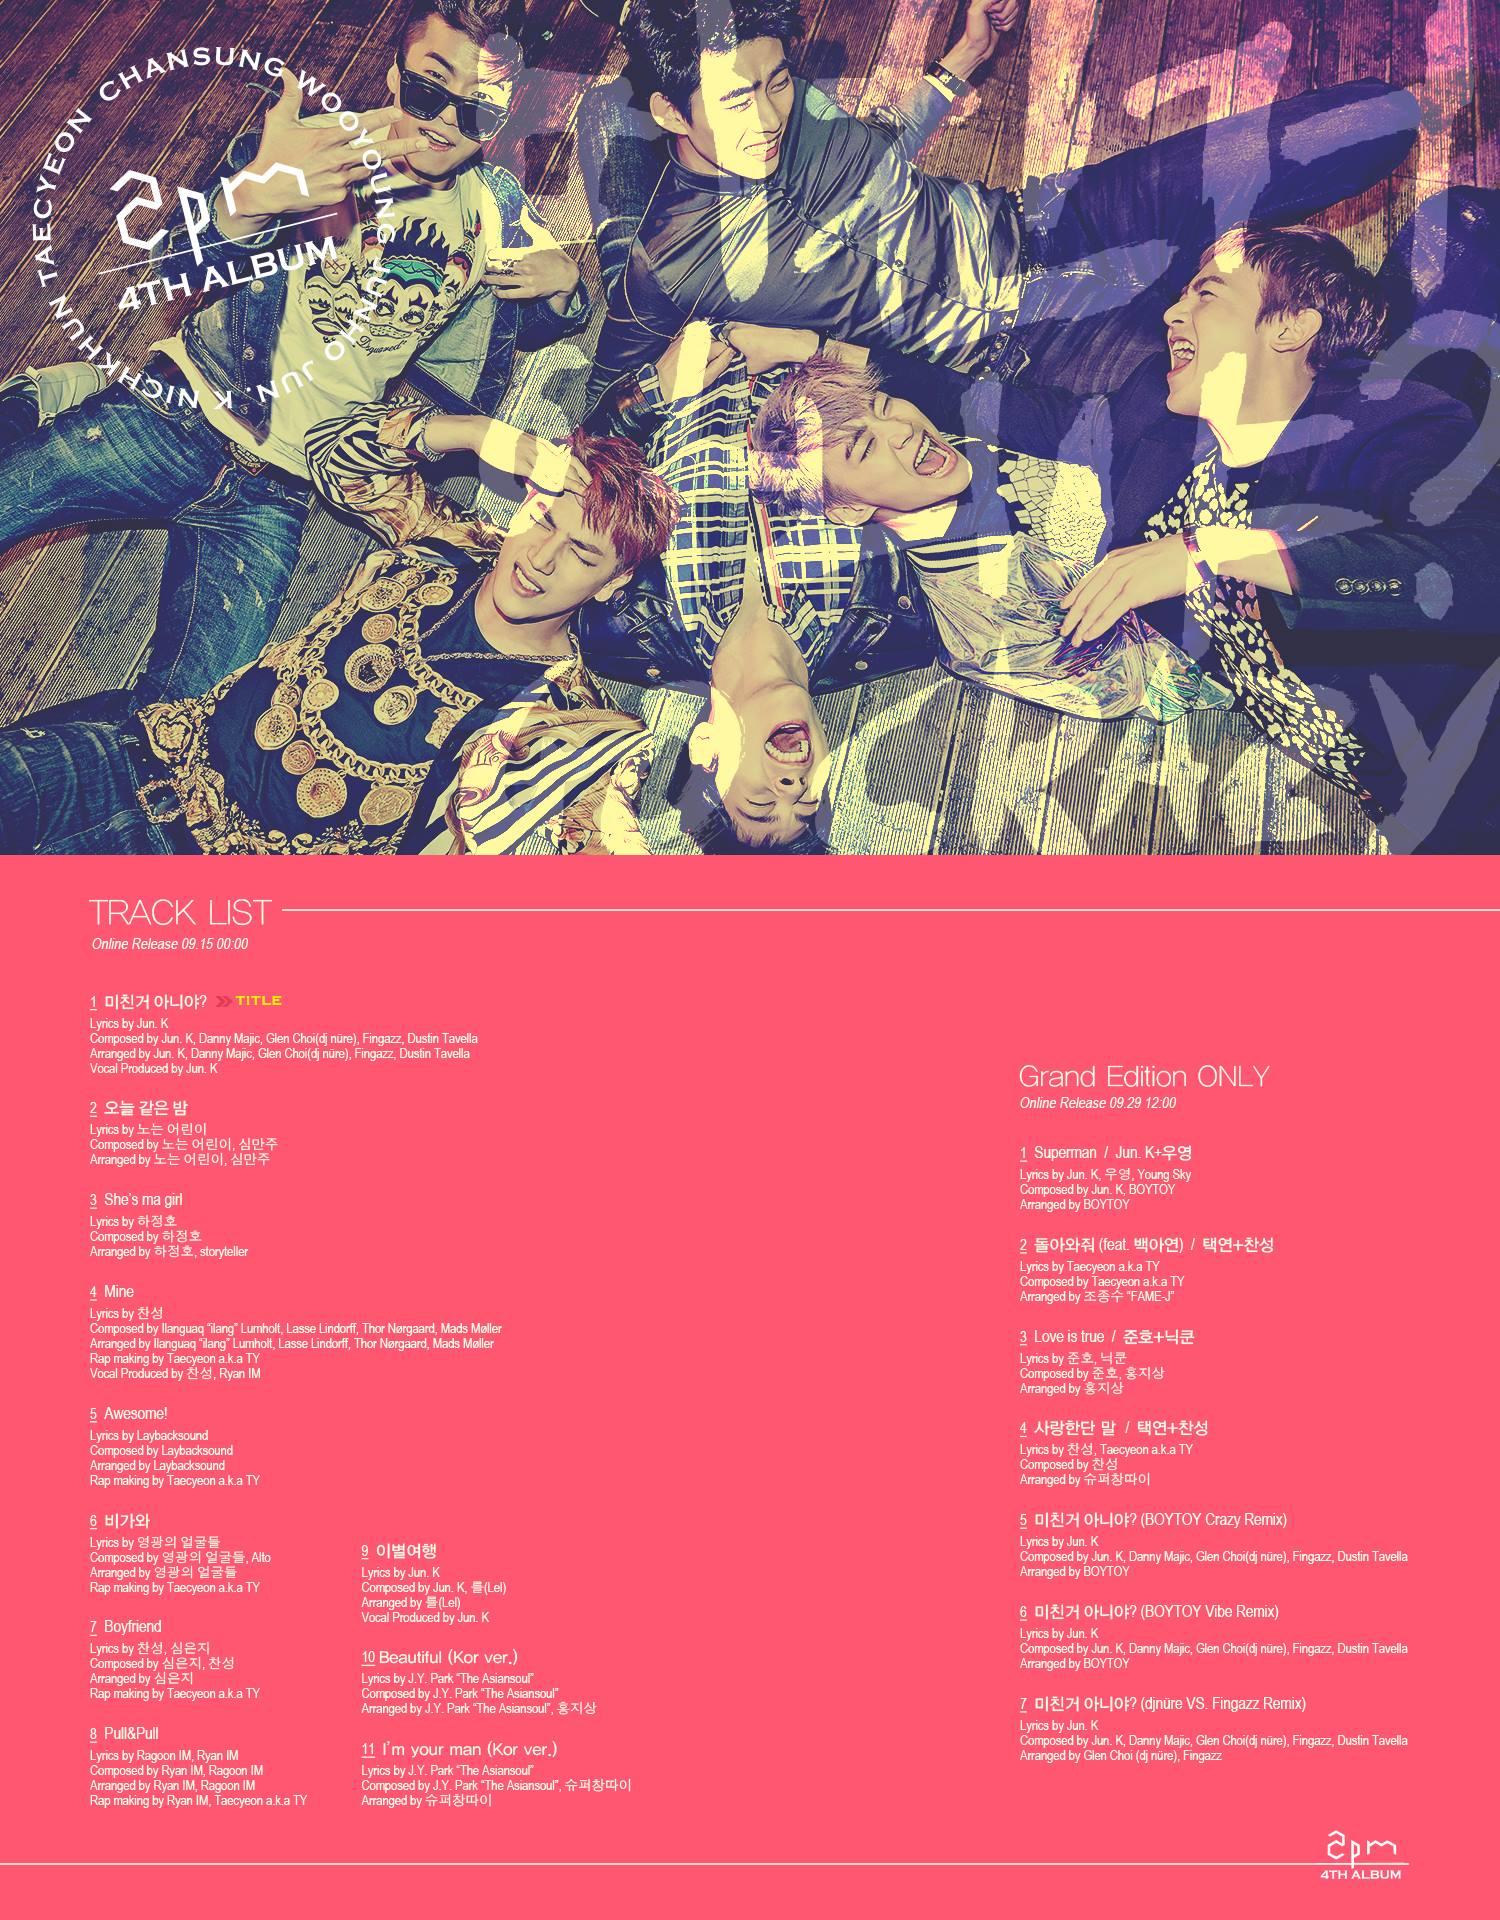 2PM tracklist